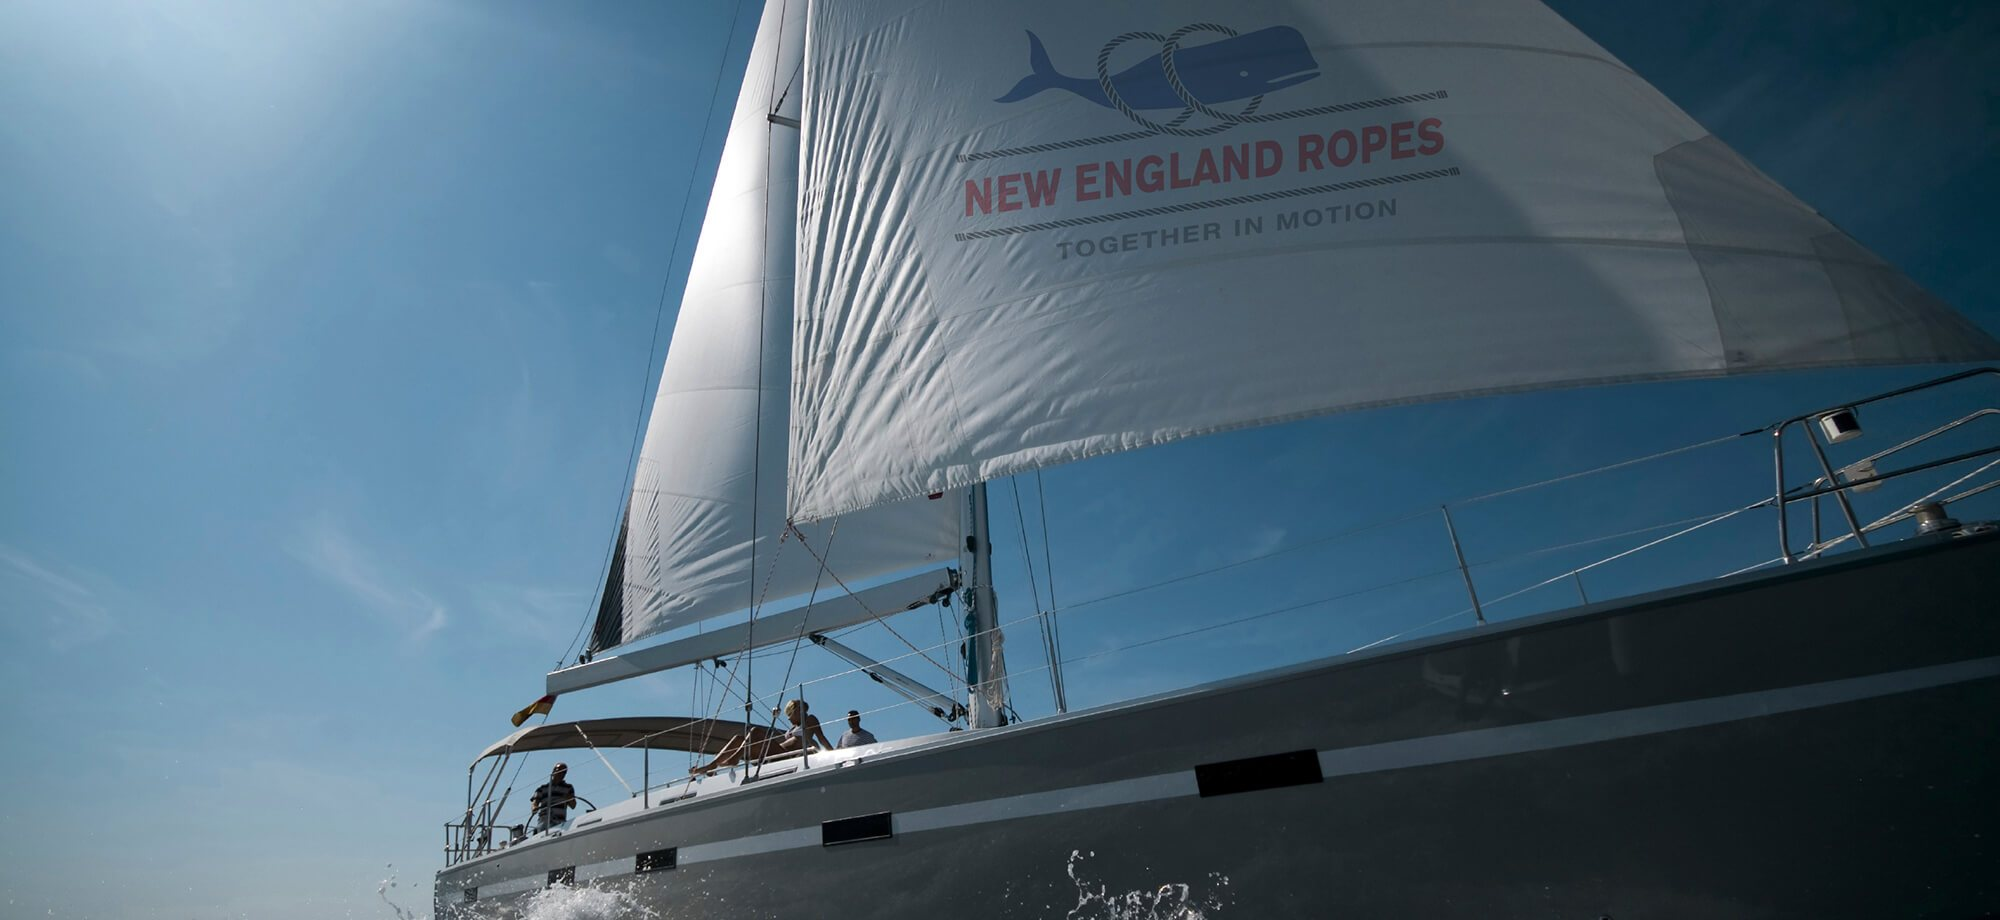 www neropes com - New England Ropes